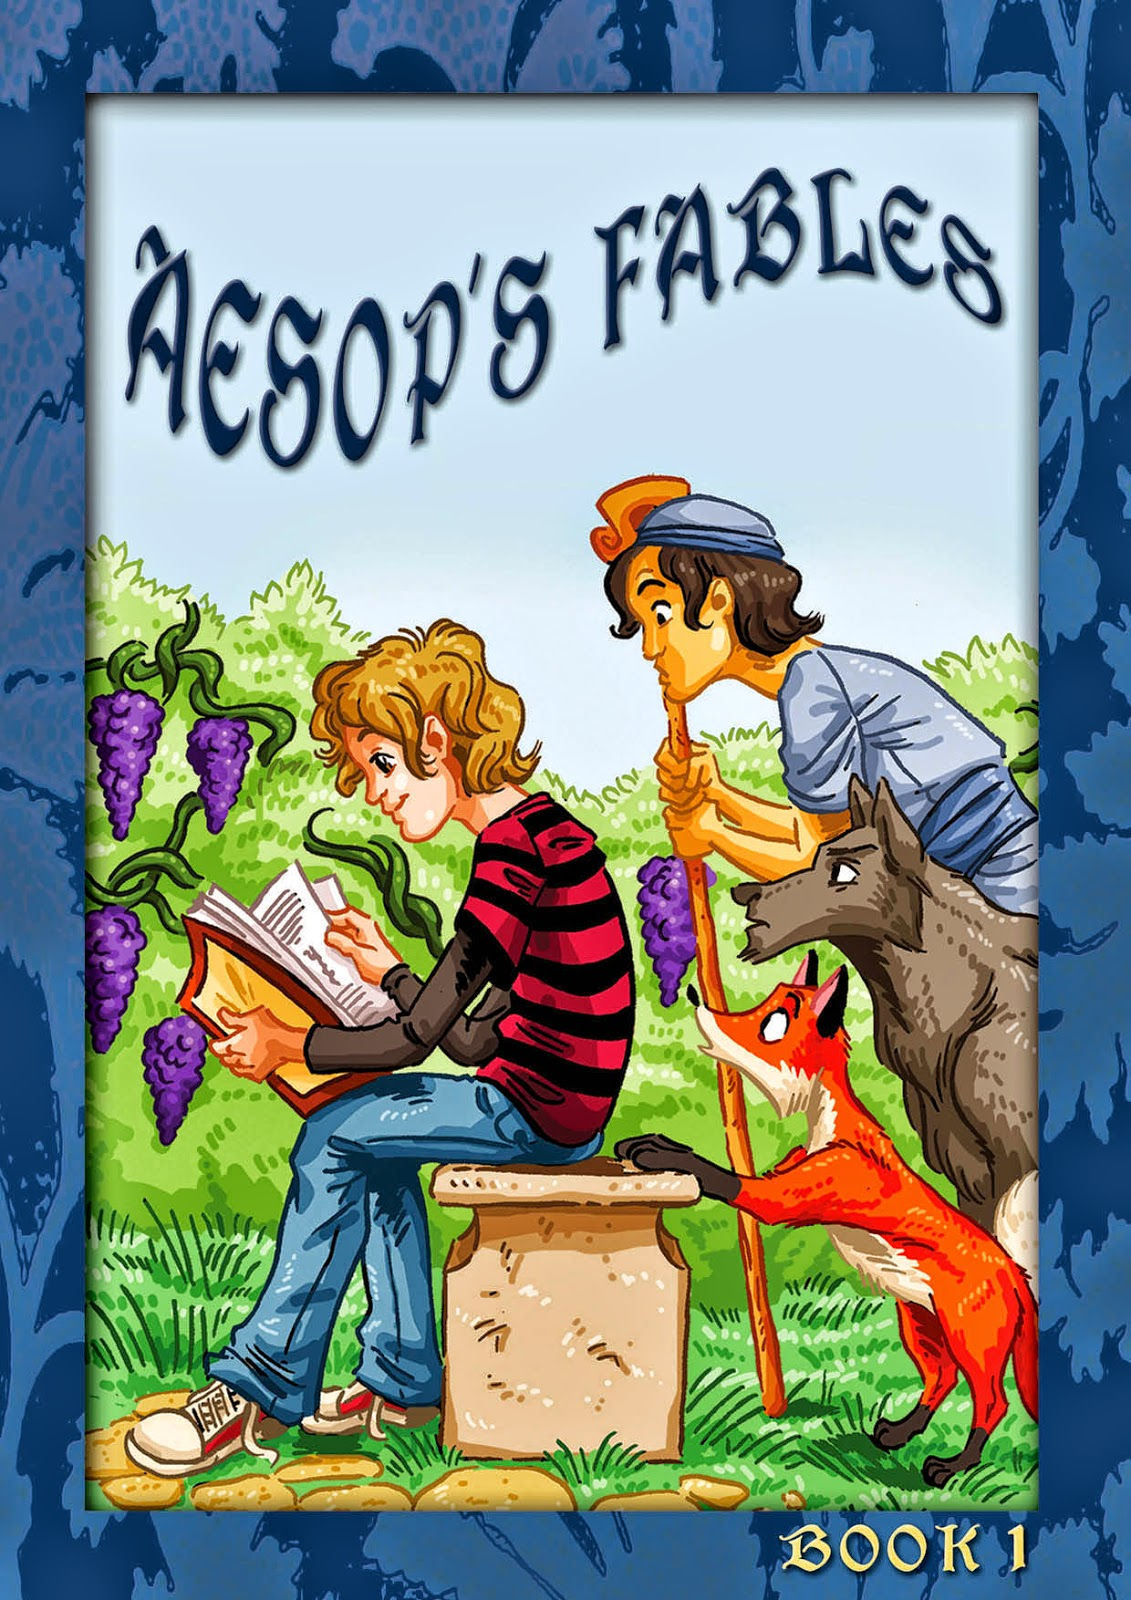 Aesop' Fables, Bulgarian-English, Kindle, Online, Digital, Electronic